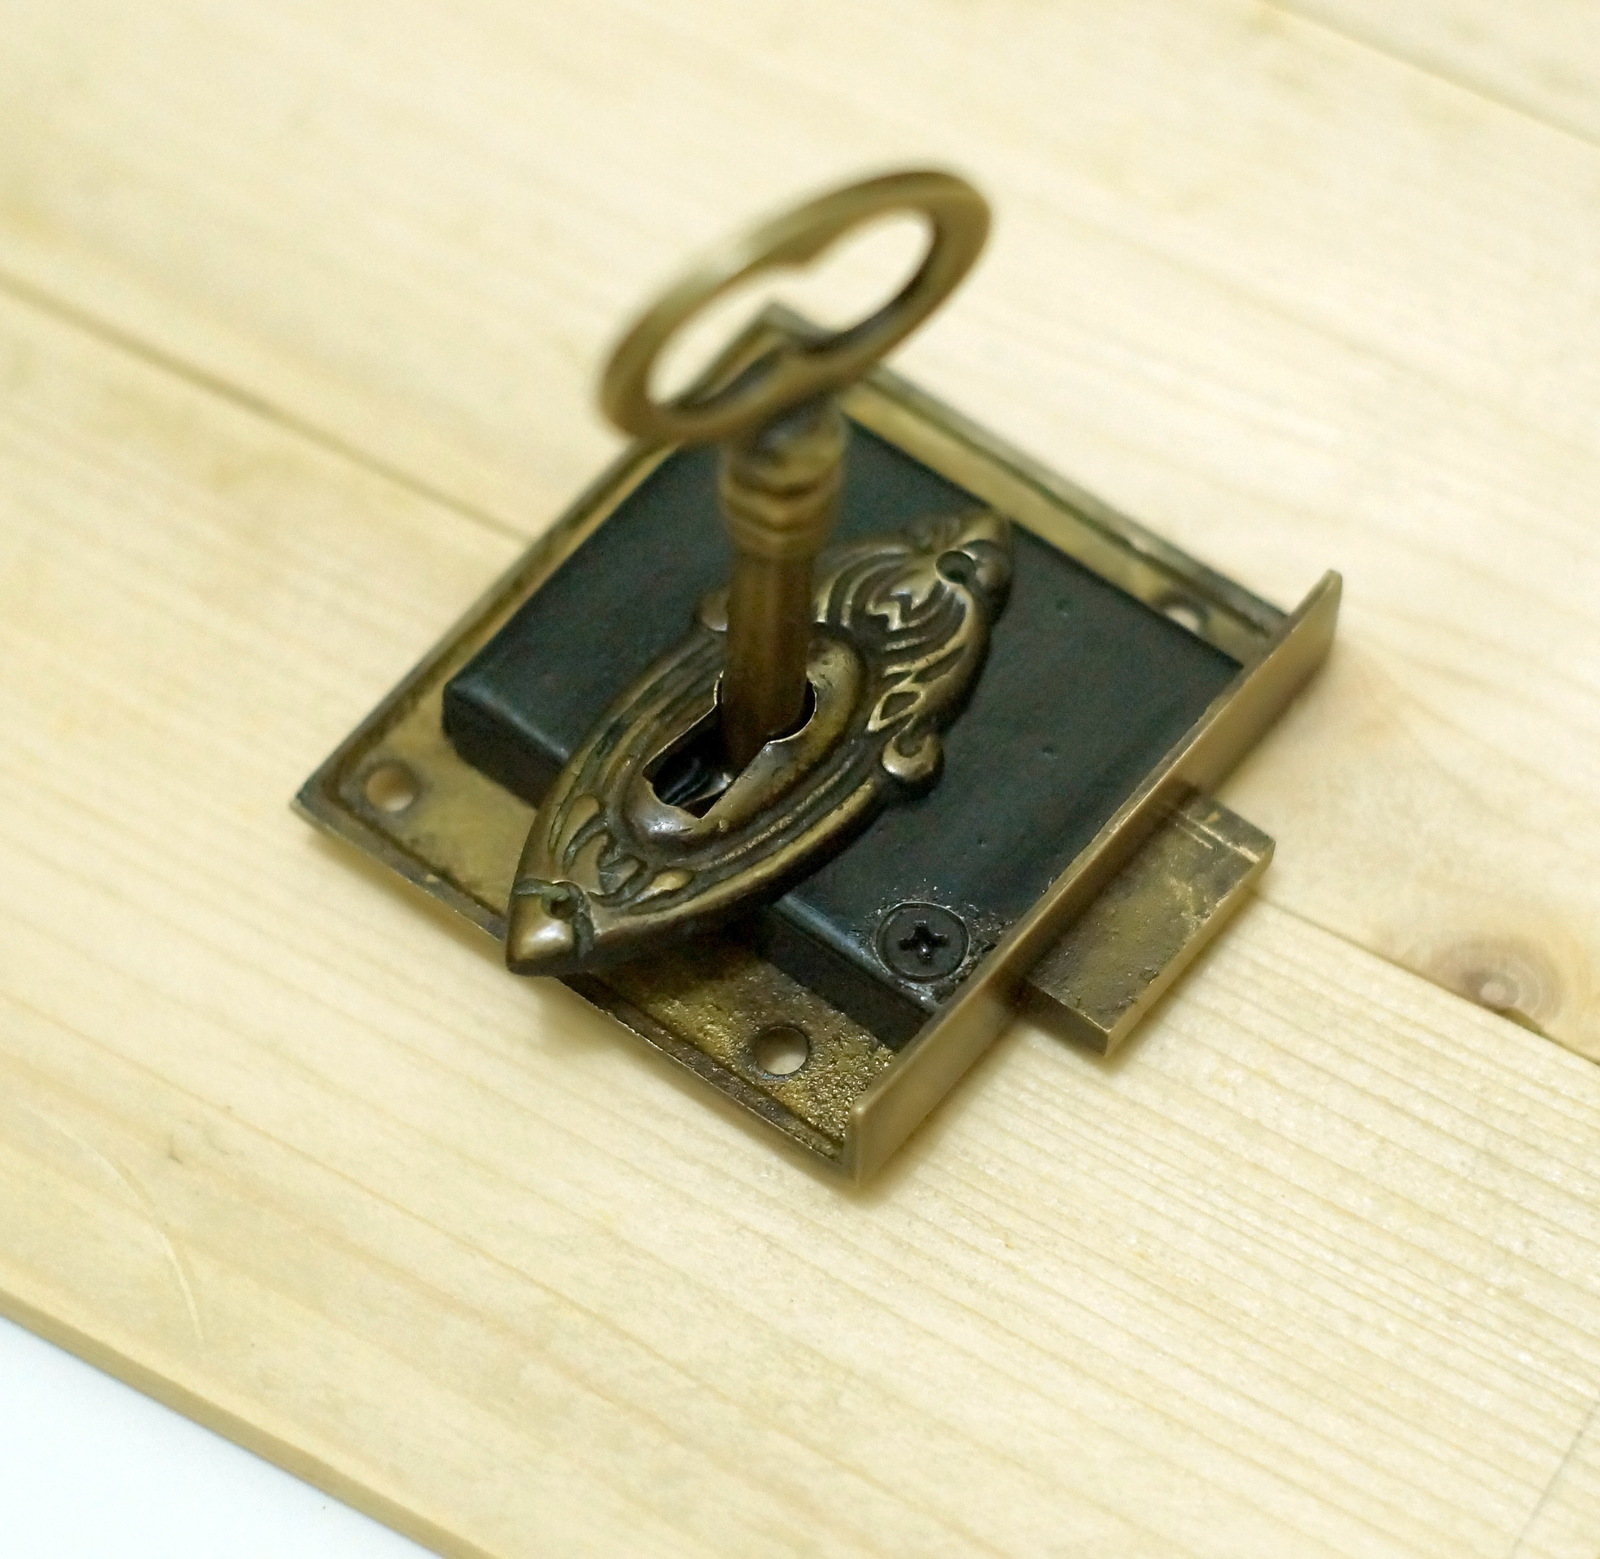 Set vintage classic western key hole plate with antique skeleton key lock locks keys - Antique peephole ...